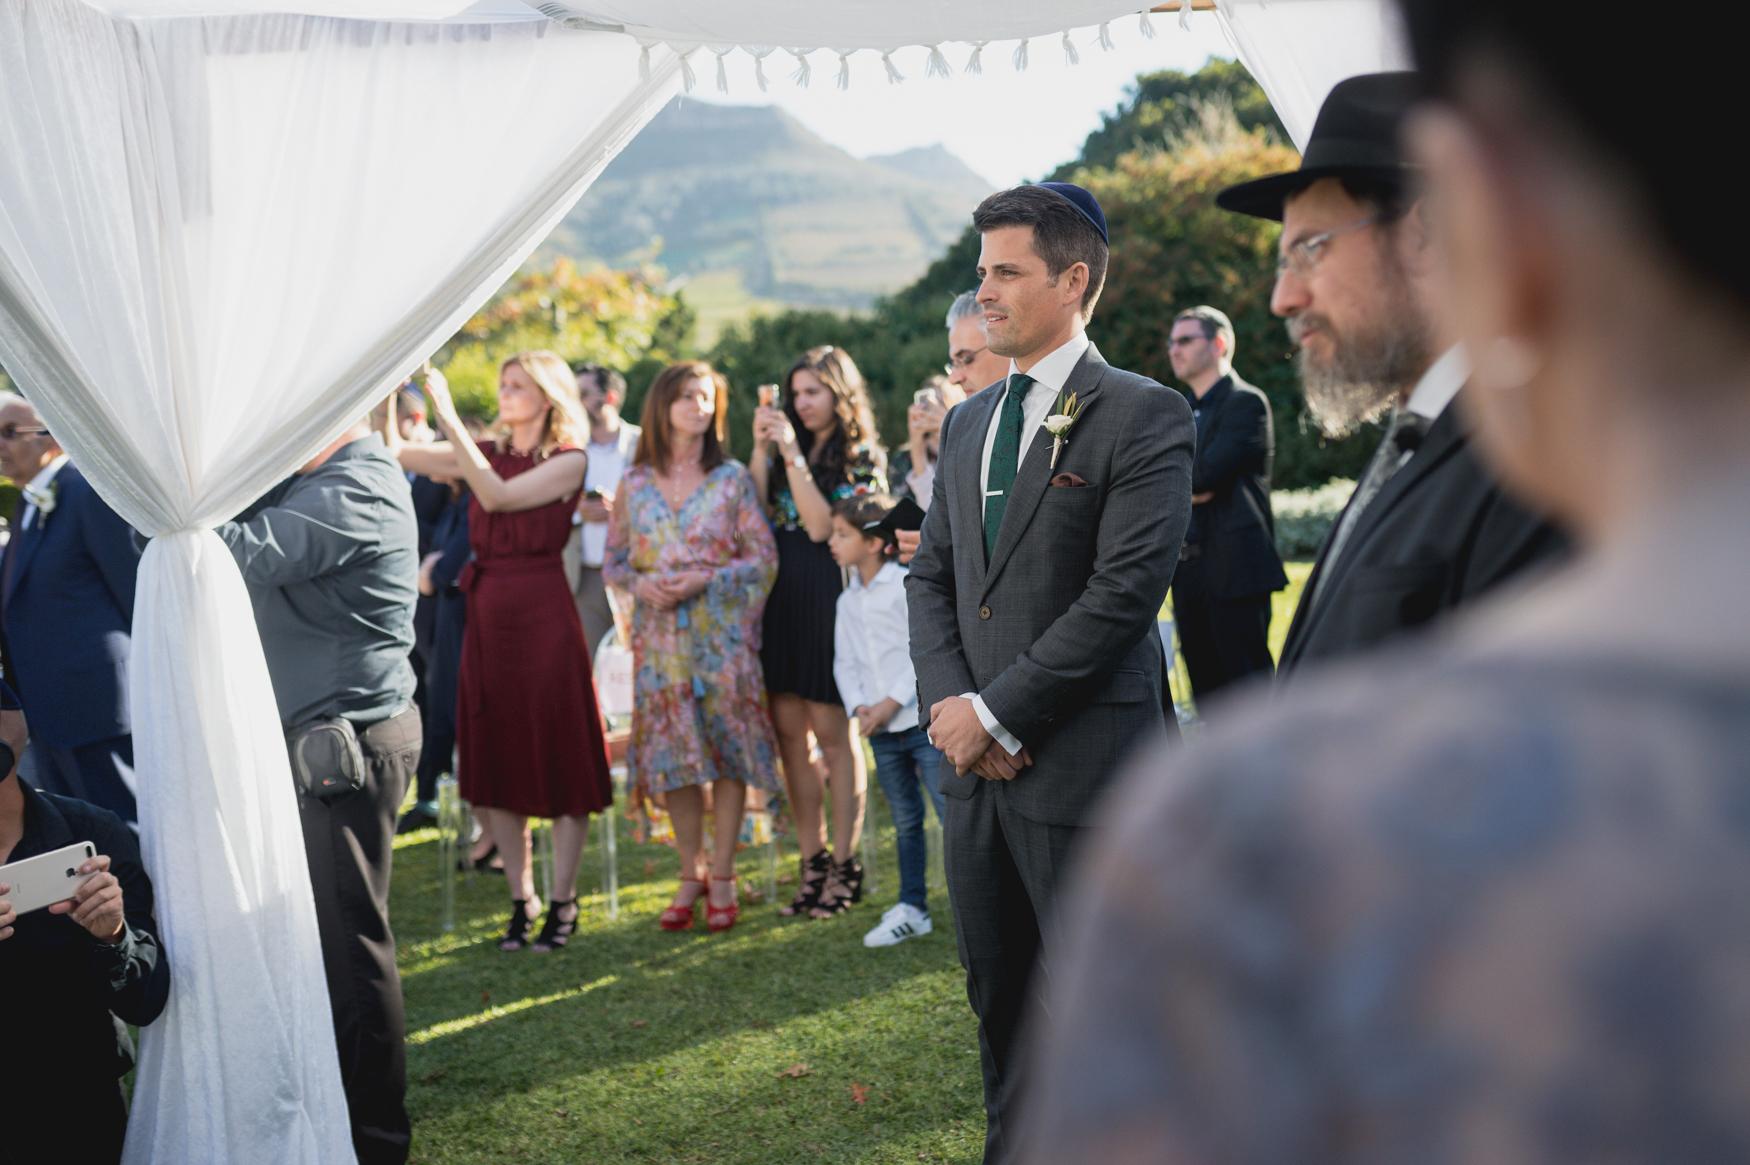 Leon_&_Martine's_Wedding_Photographs_17th_April_2019_@johnhenryweddingphoto_Low_Resolution_Web-235.JPG